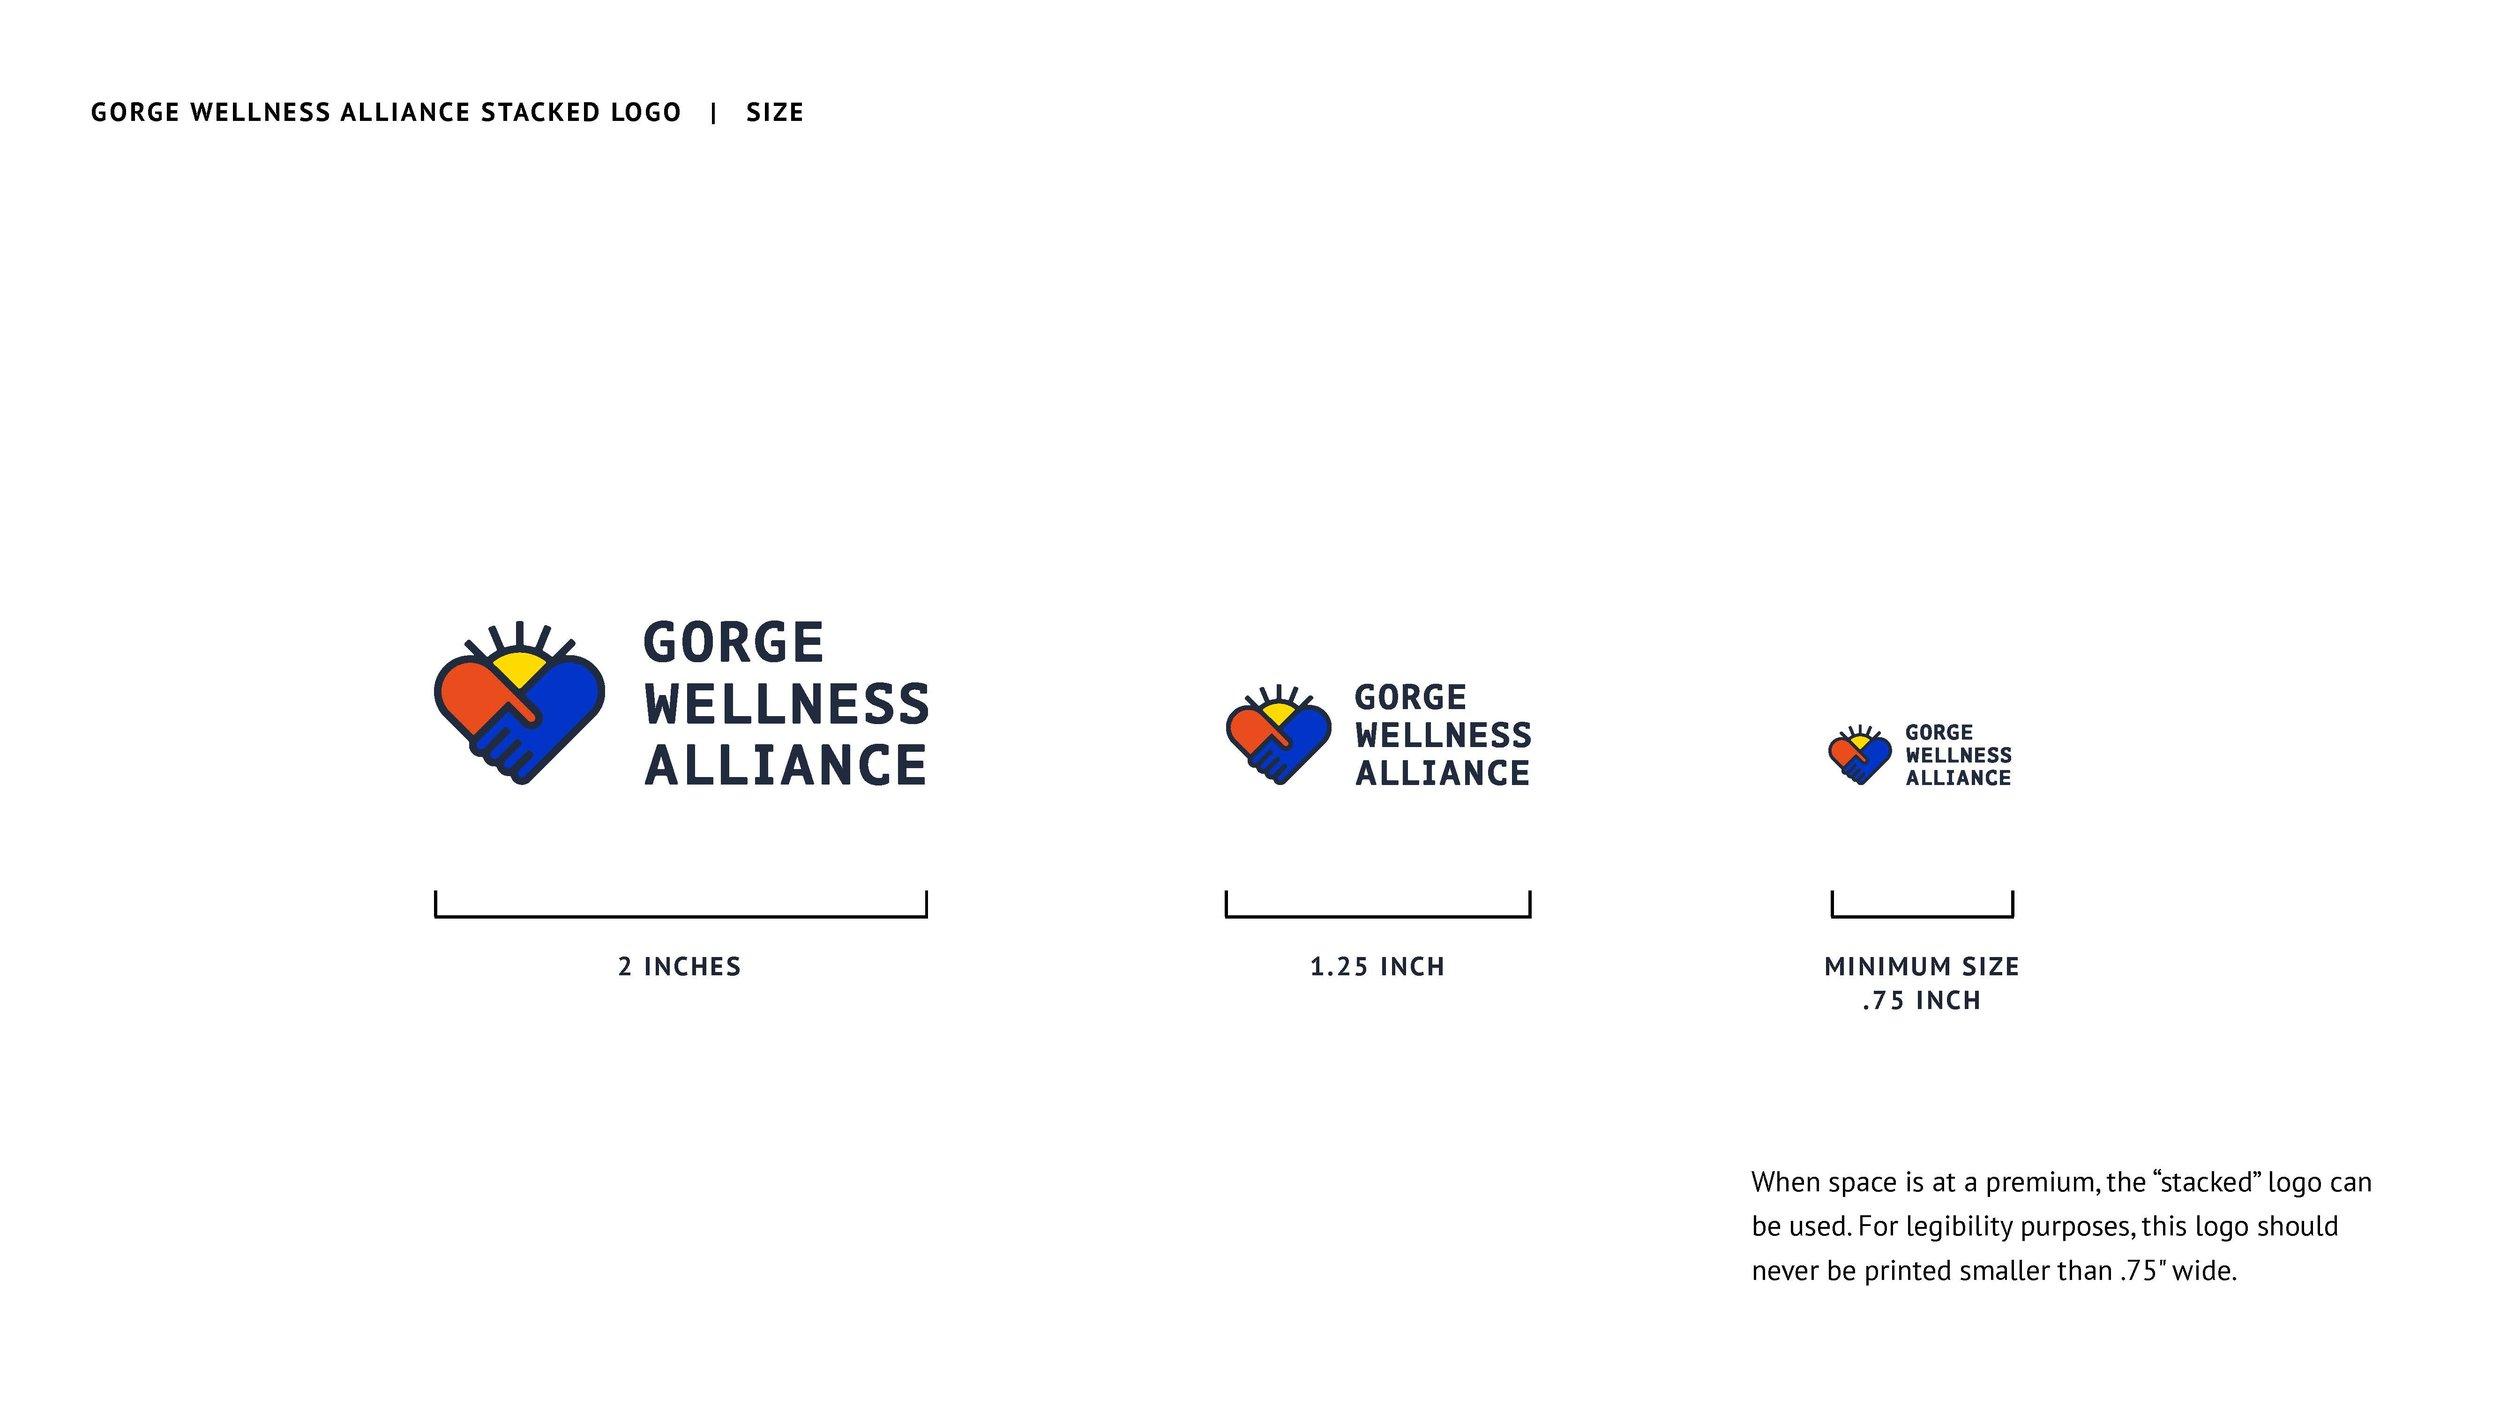 GWA_Brand Identity_Page_18.jpg